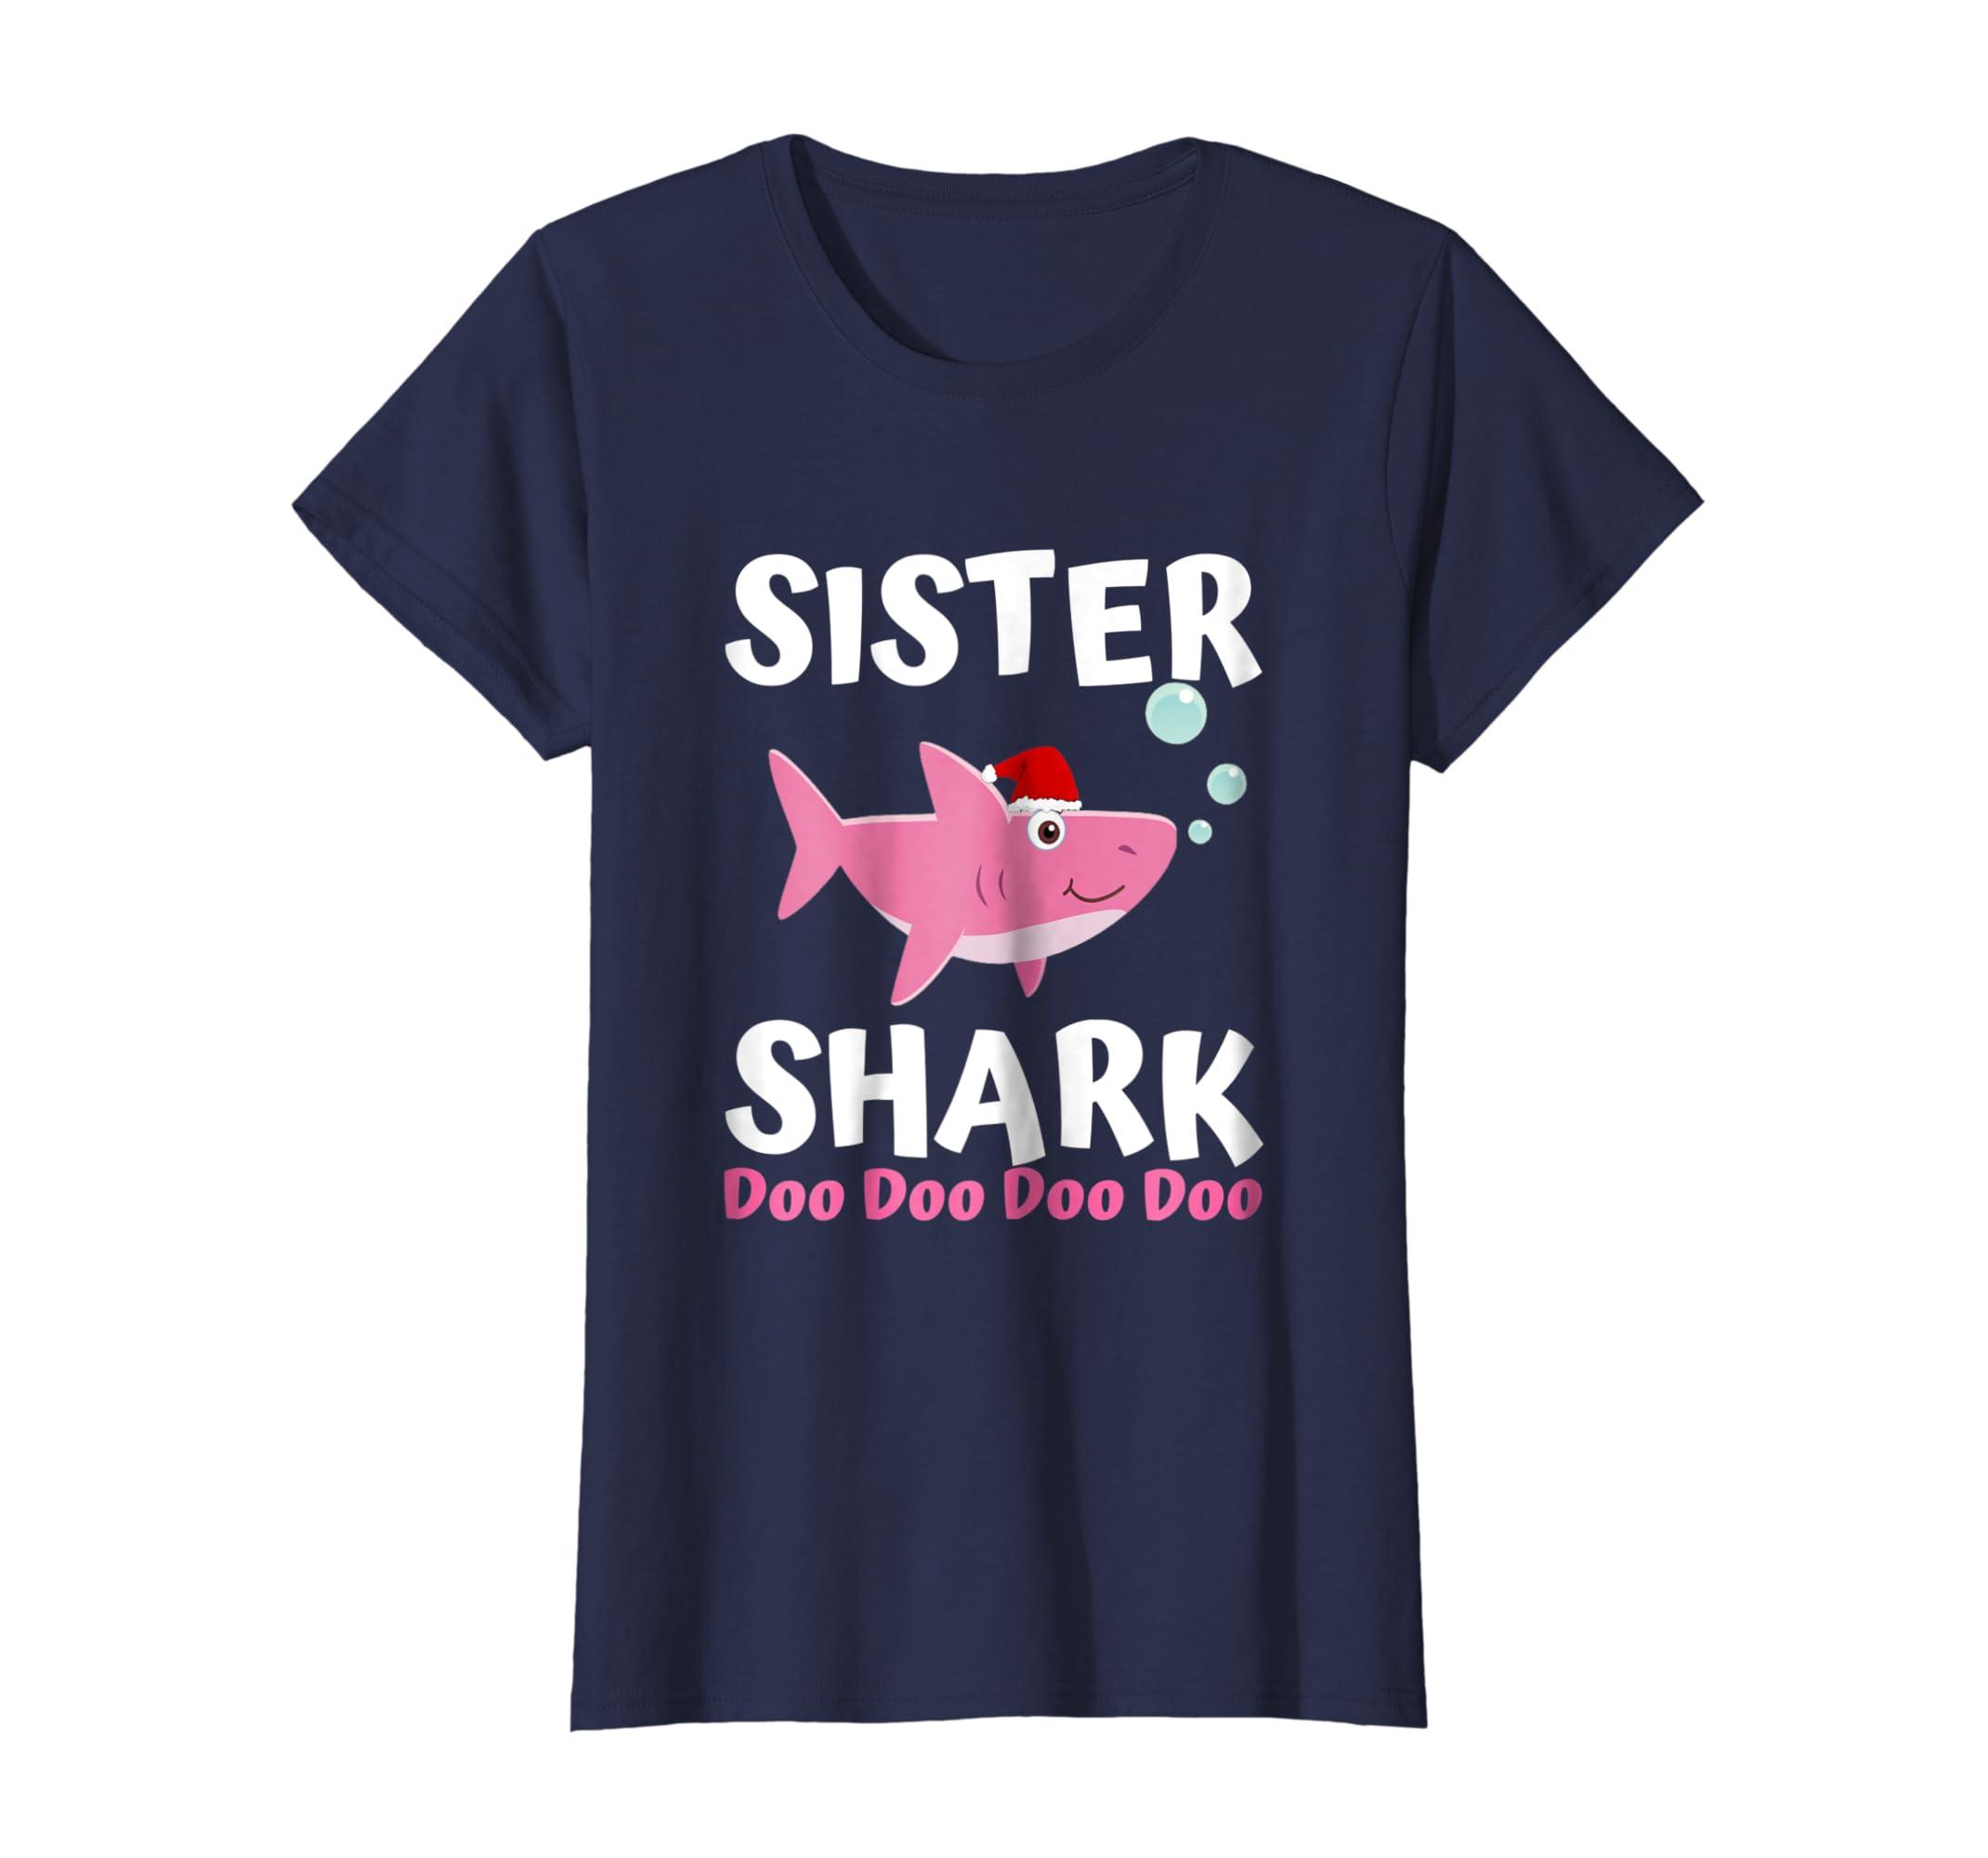 accce6b4 Amazon.com: Sister Shark Doo Doo Shirt Kids Toddler Christmas Baby Shark:  Clothing